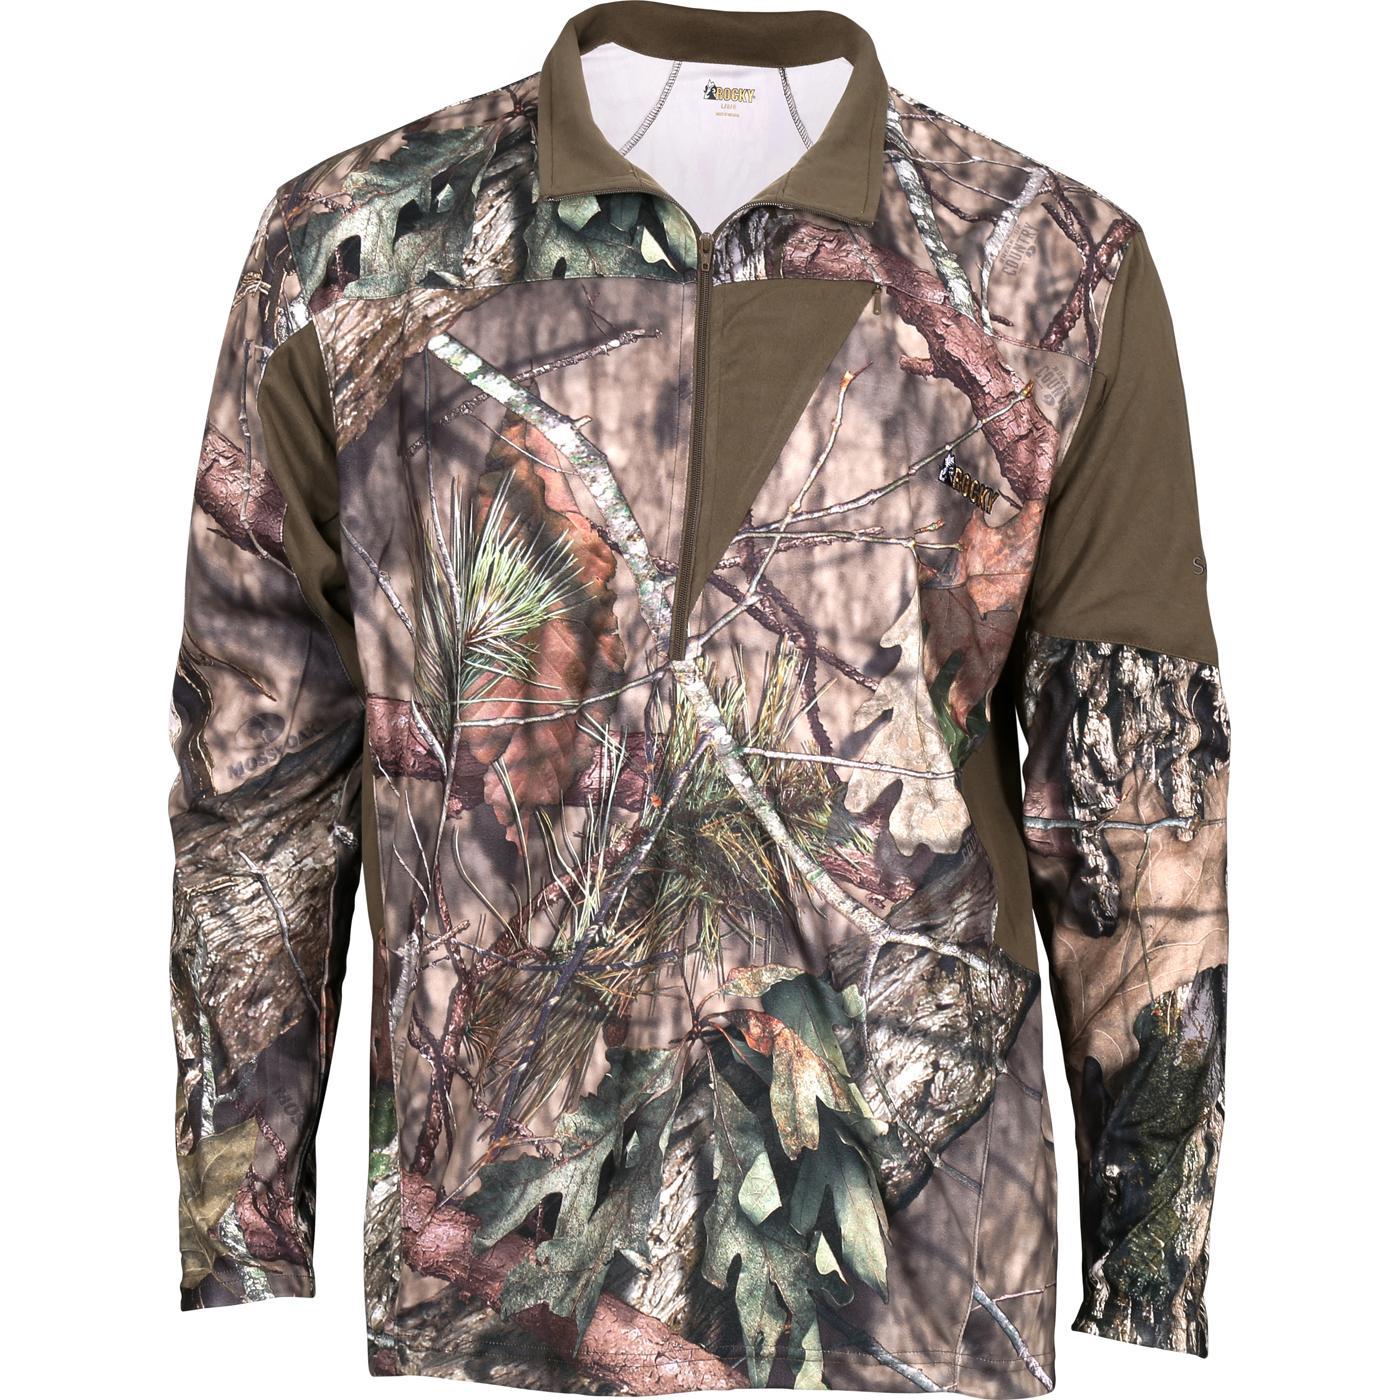 e8e0bb8b Rocky SilentHunter 1/4 Zip ShirtRocky SilentHunter 1/4 Zip Shirt, Mossy Oak  Country